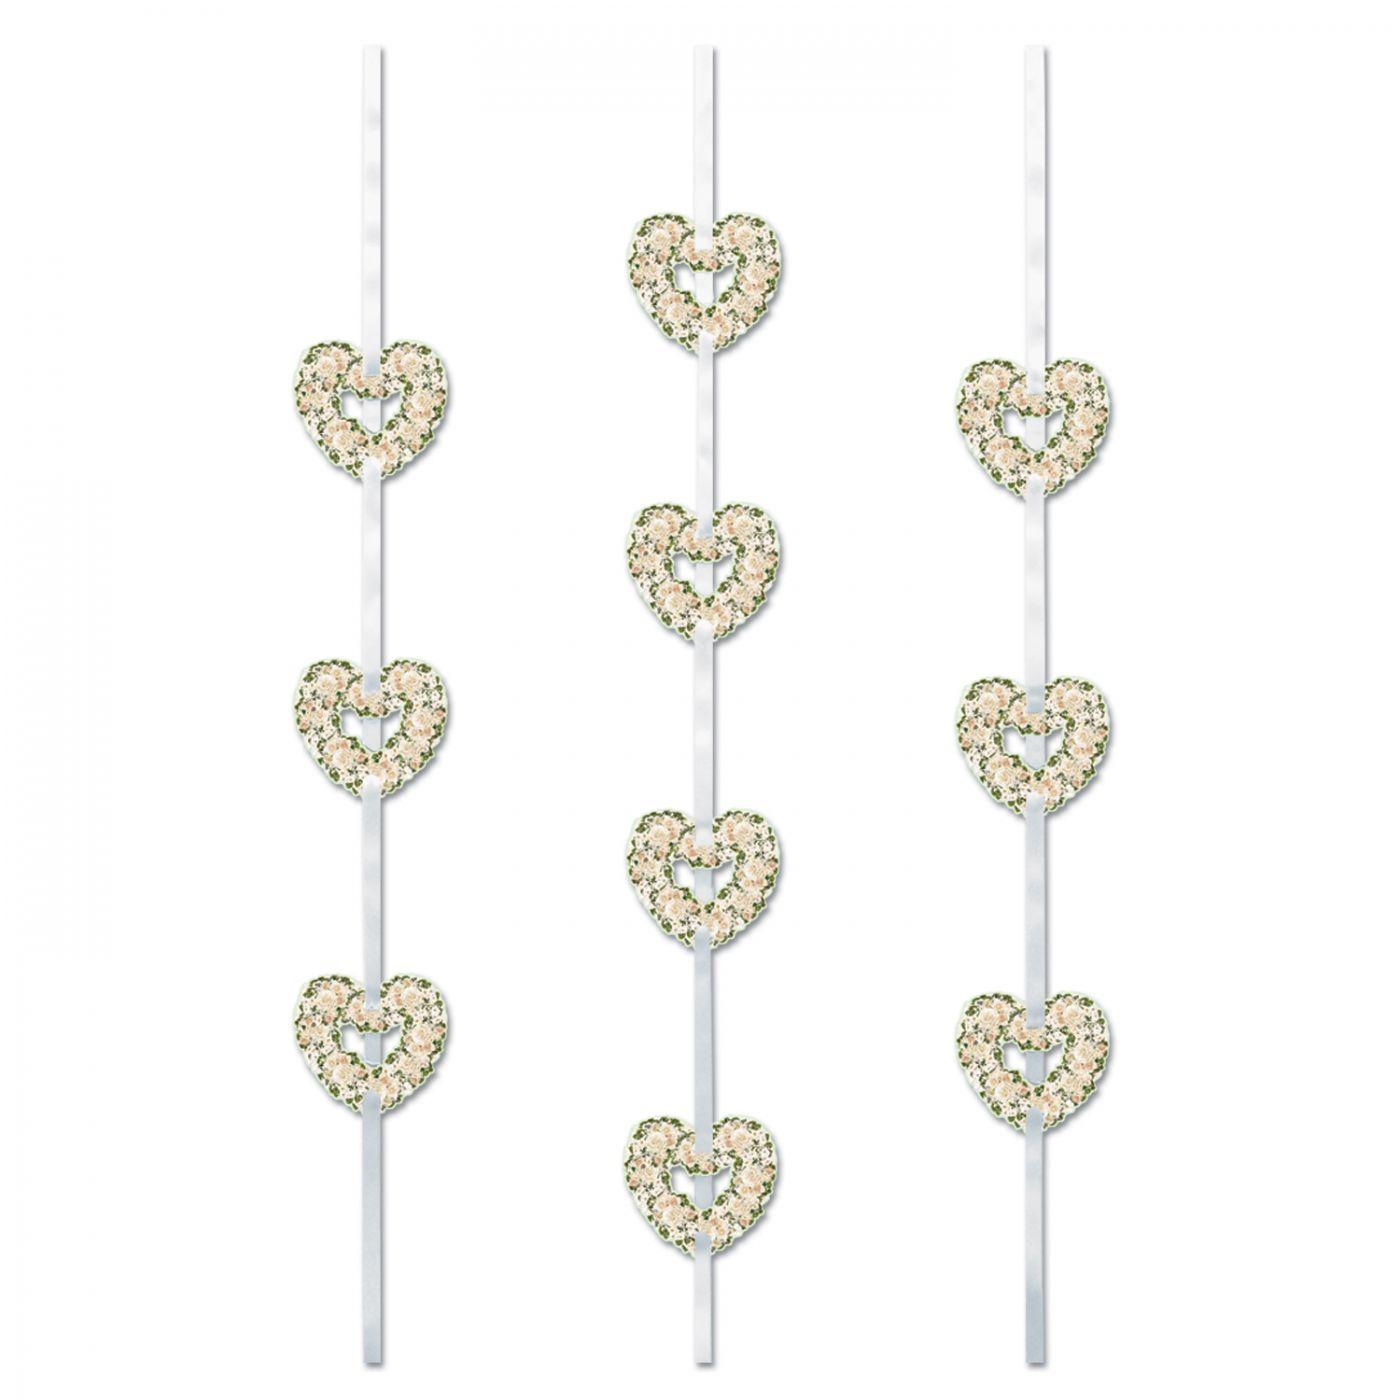 Image of Heart Ribbon Stringers